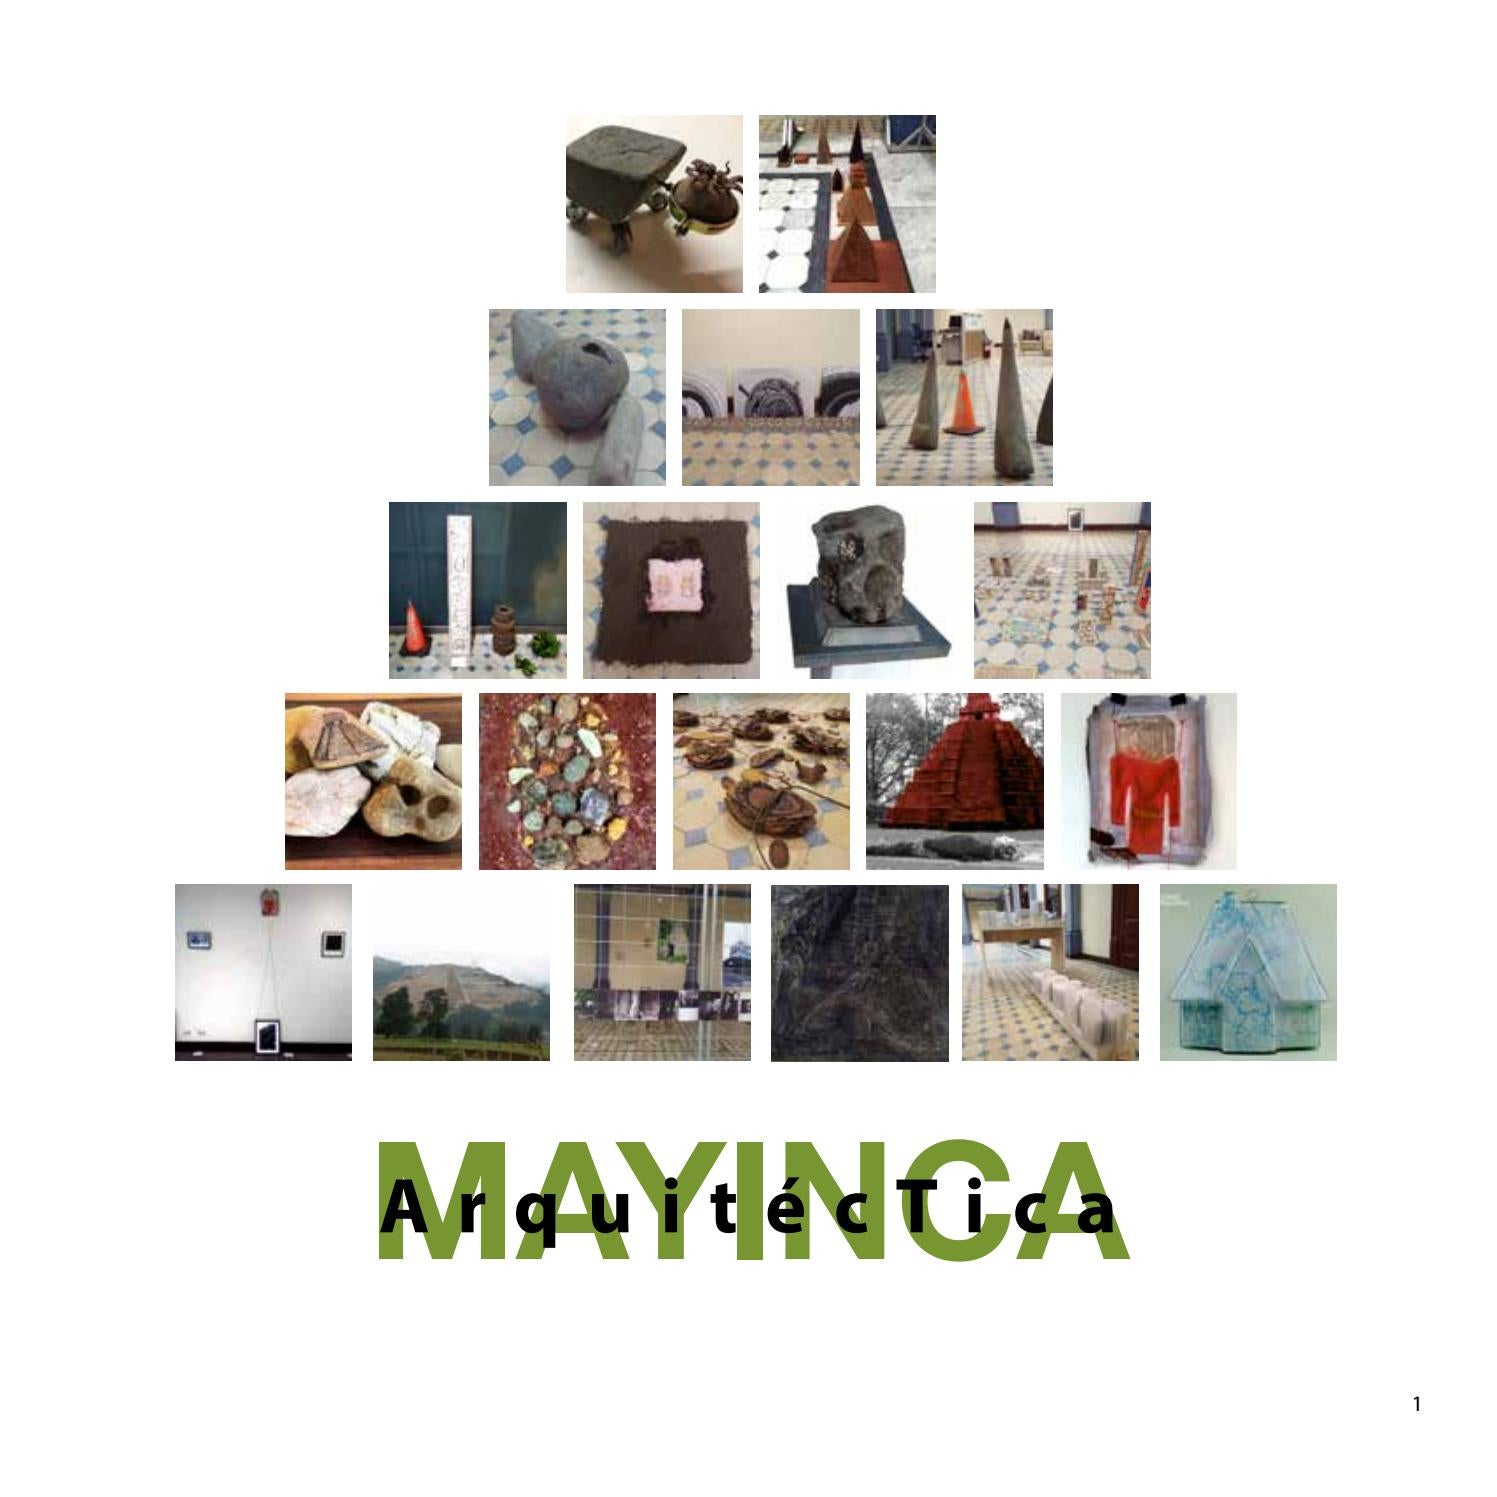 Catalogo mayinca arquitectica by Luis Fernando Quiros - issuu